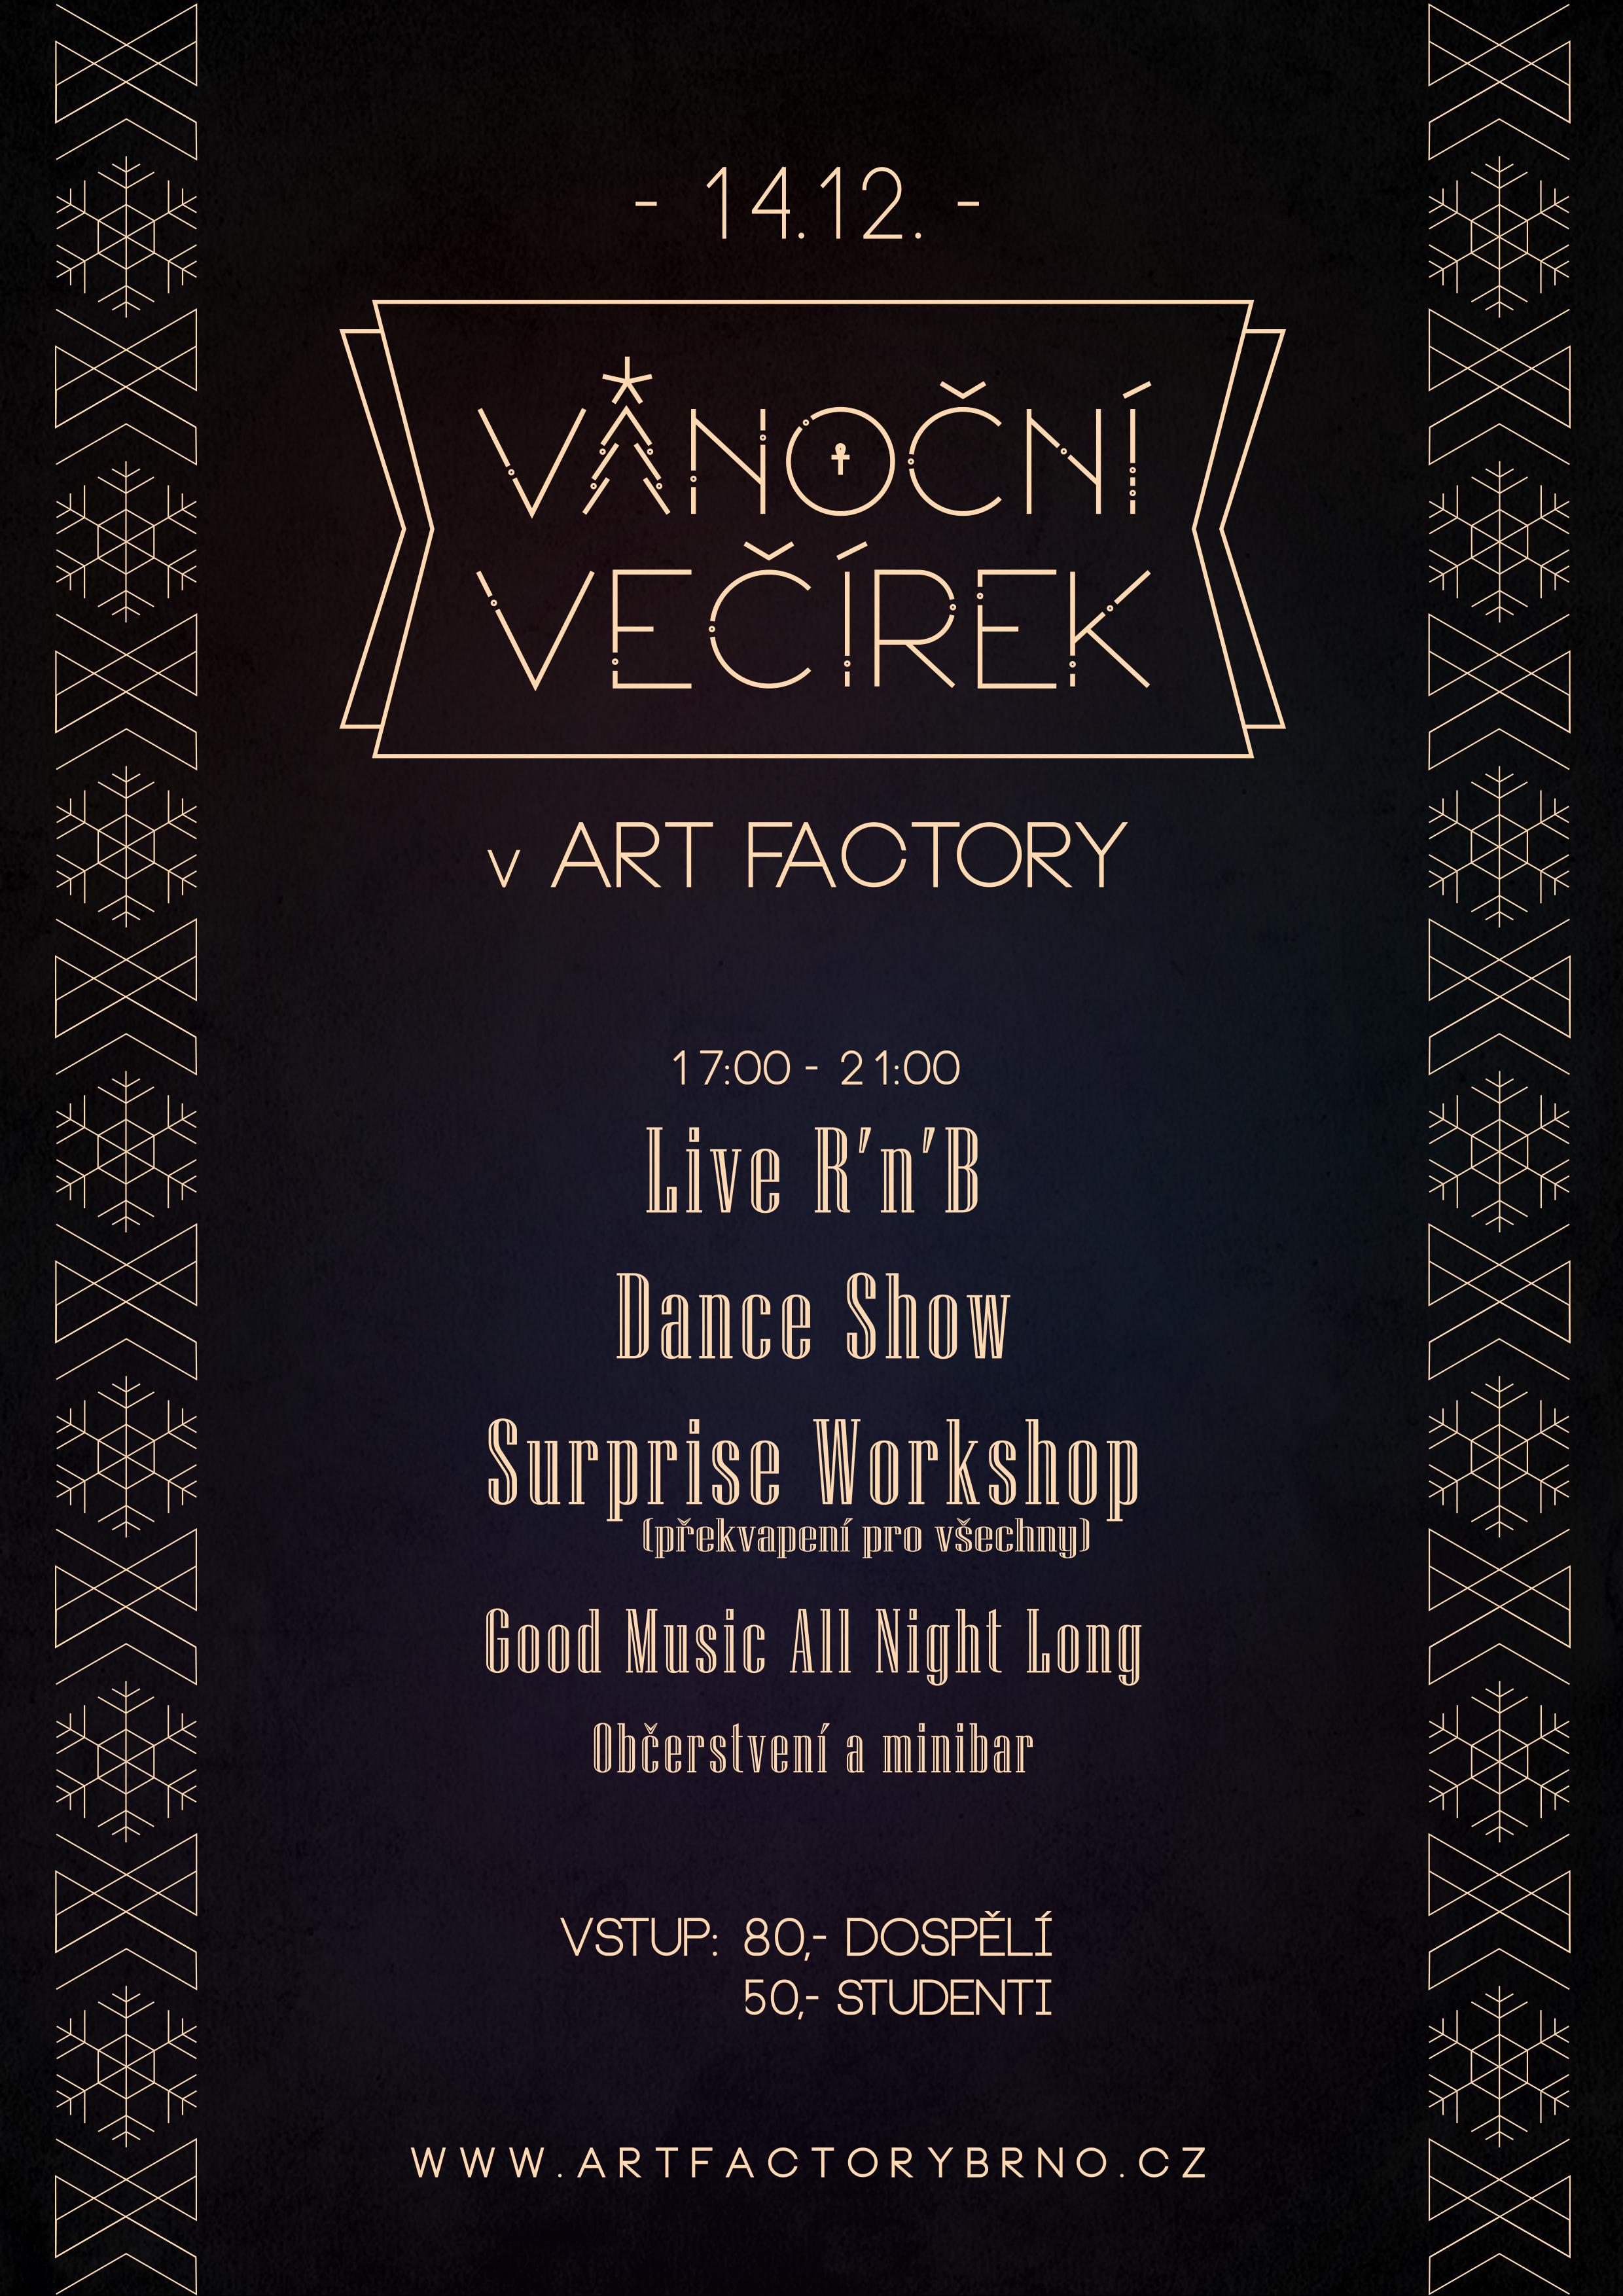 vanocnivecireka4